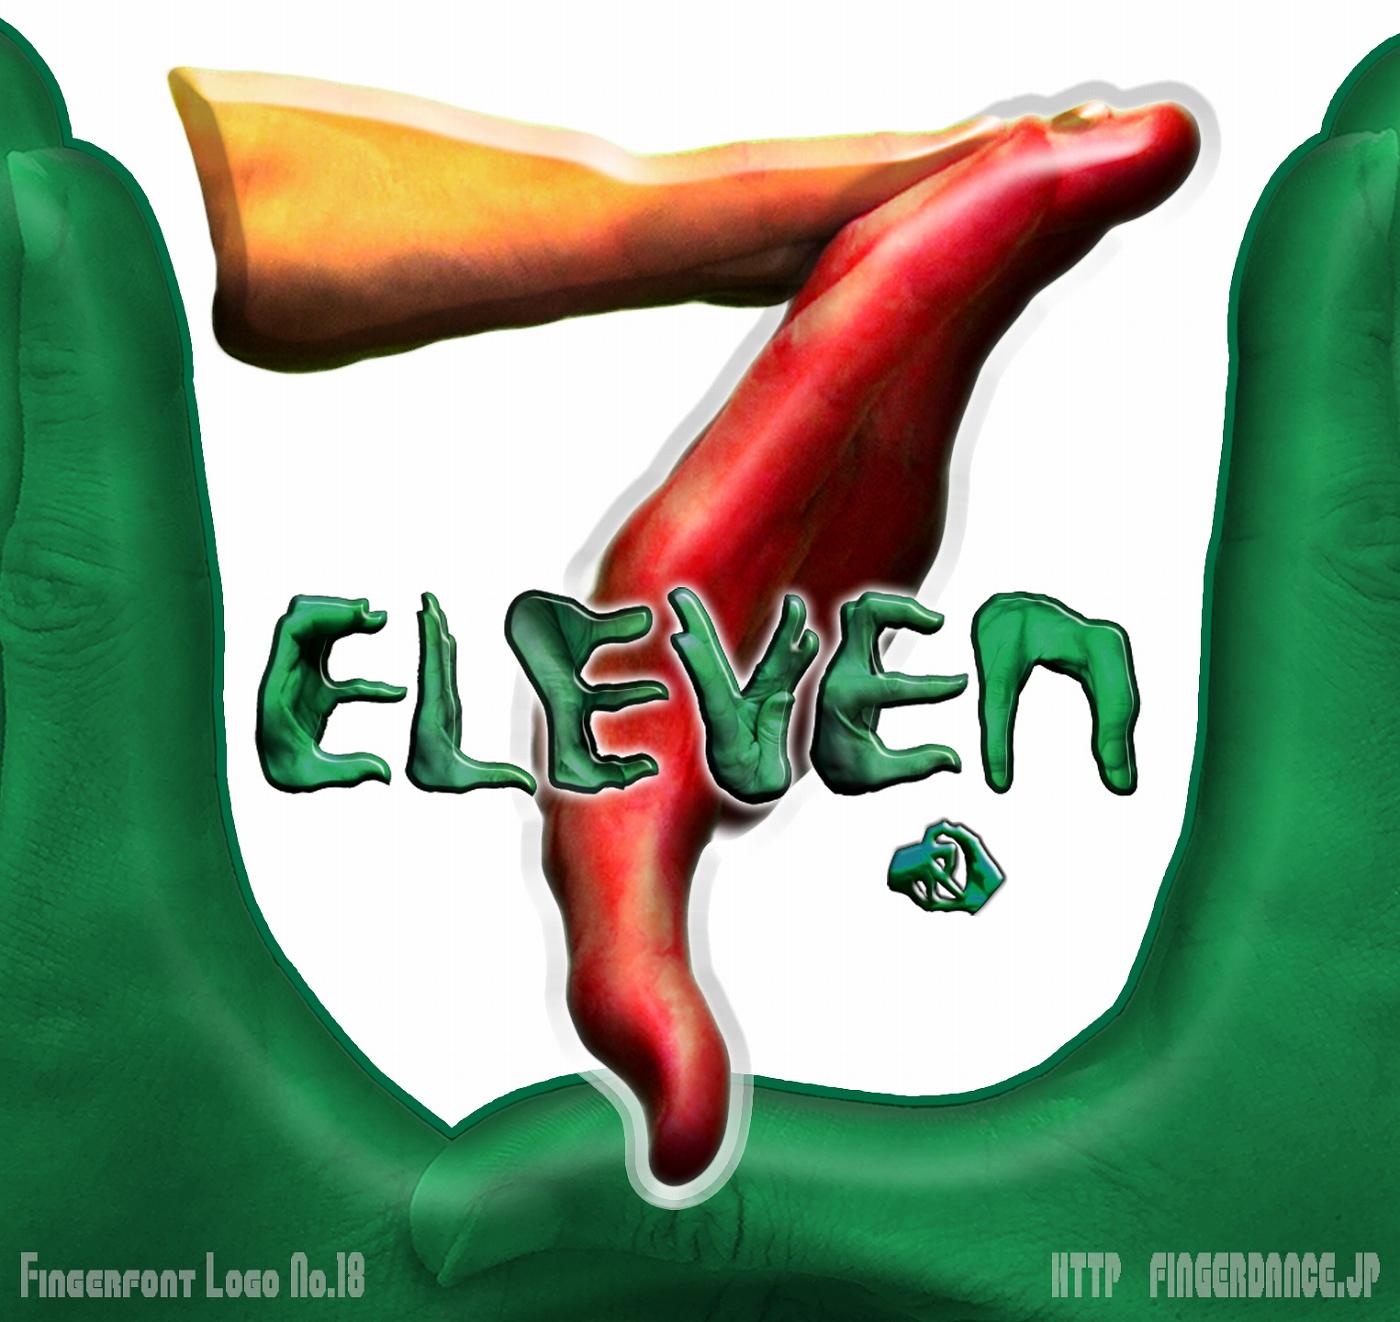 SevenEveben-fingerhttp://fingerdance.jp/L/logohand セブンイレブンフィンガーロゴハンド手指